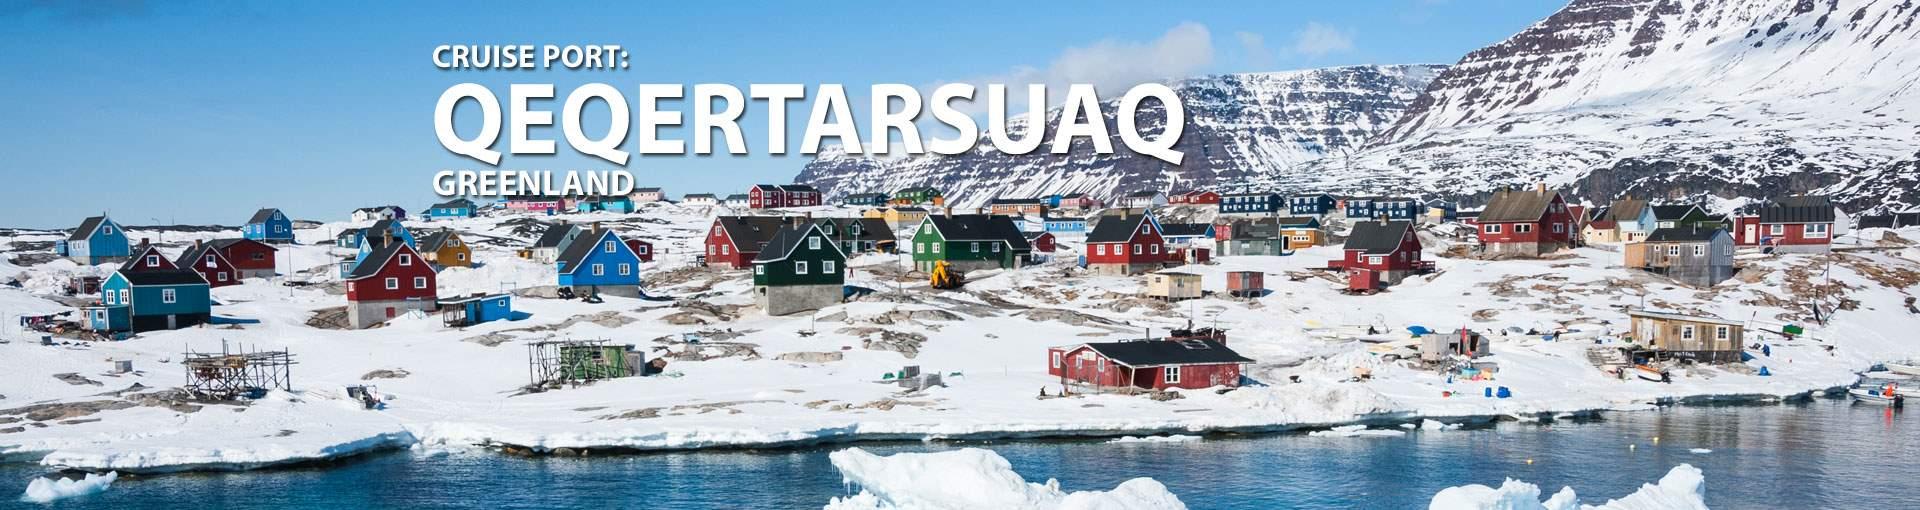 Cruises to Qeqertarsuaq, Greenland